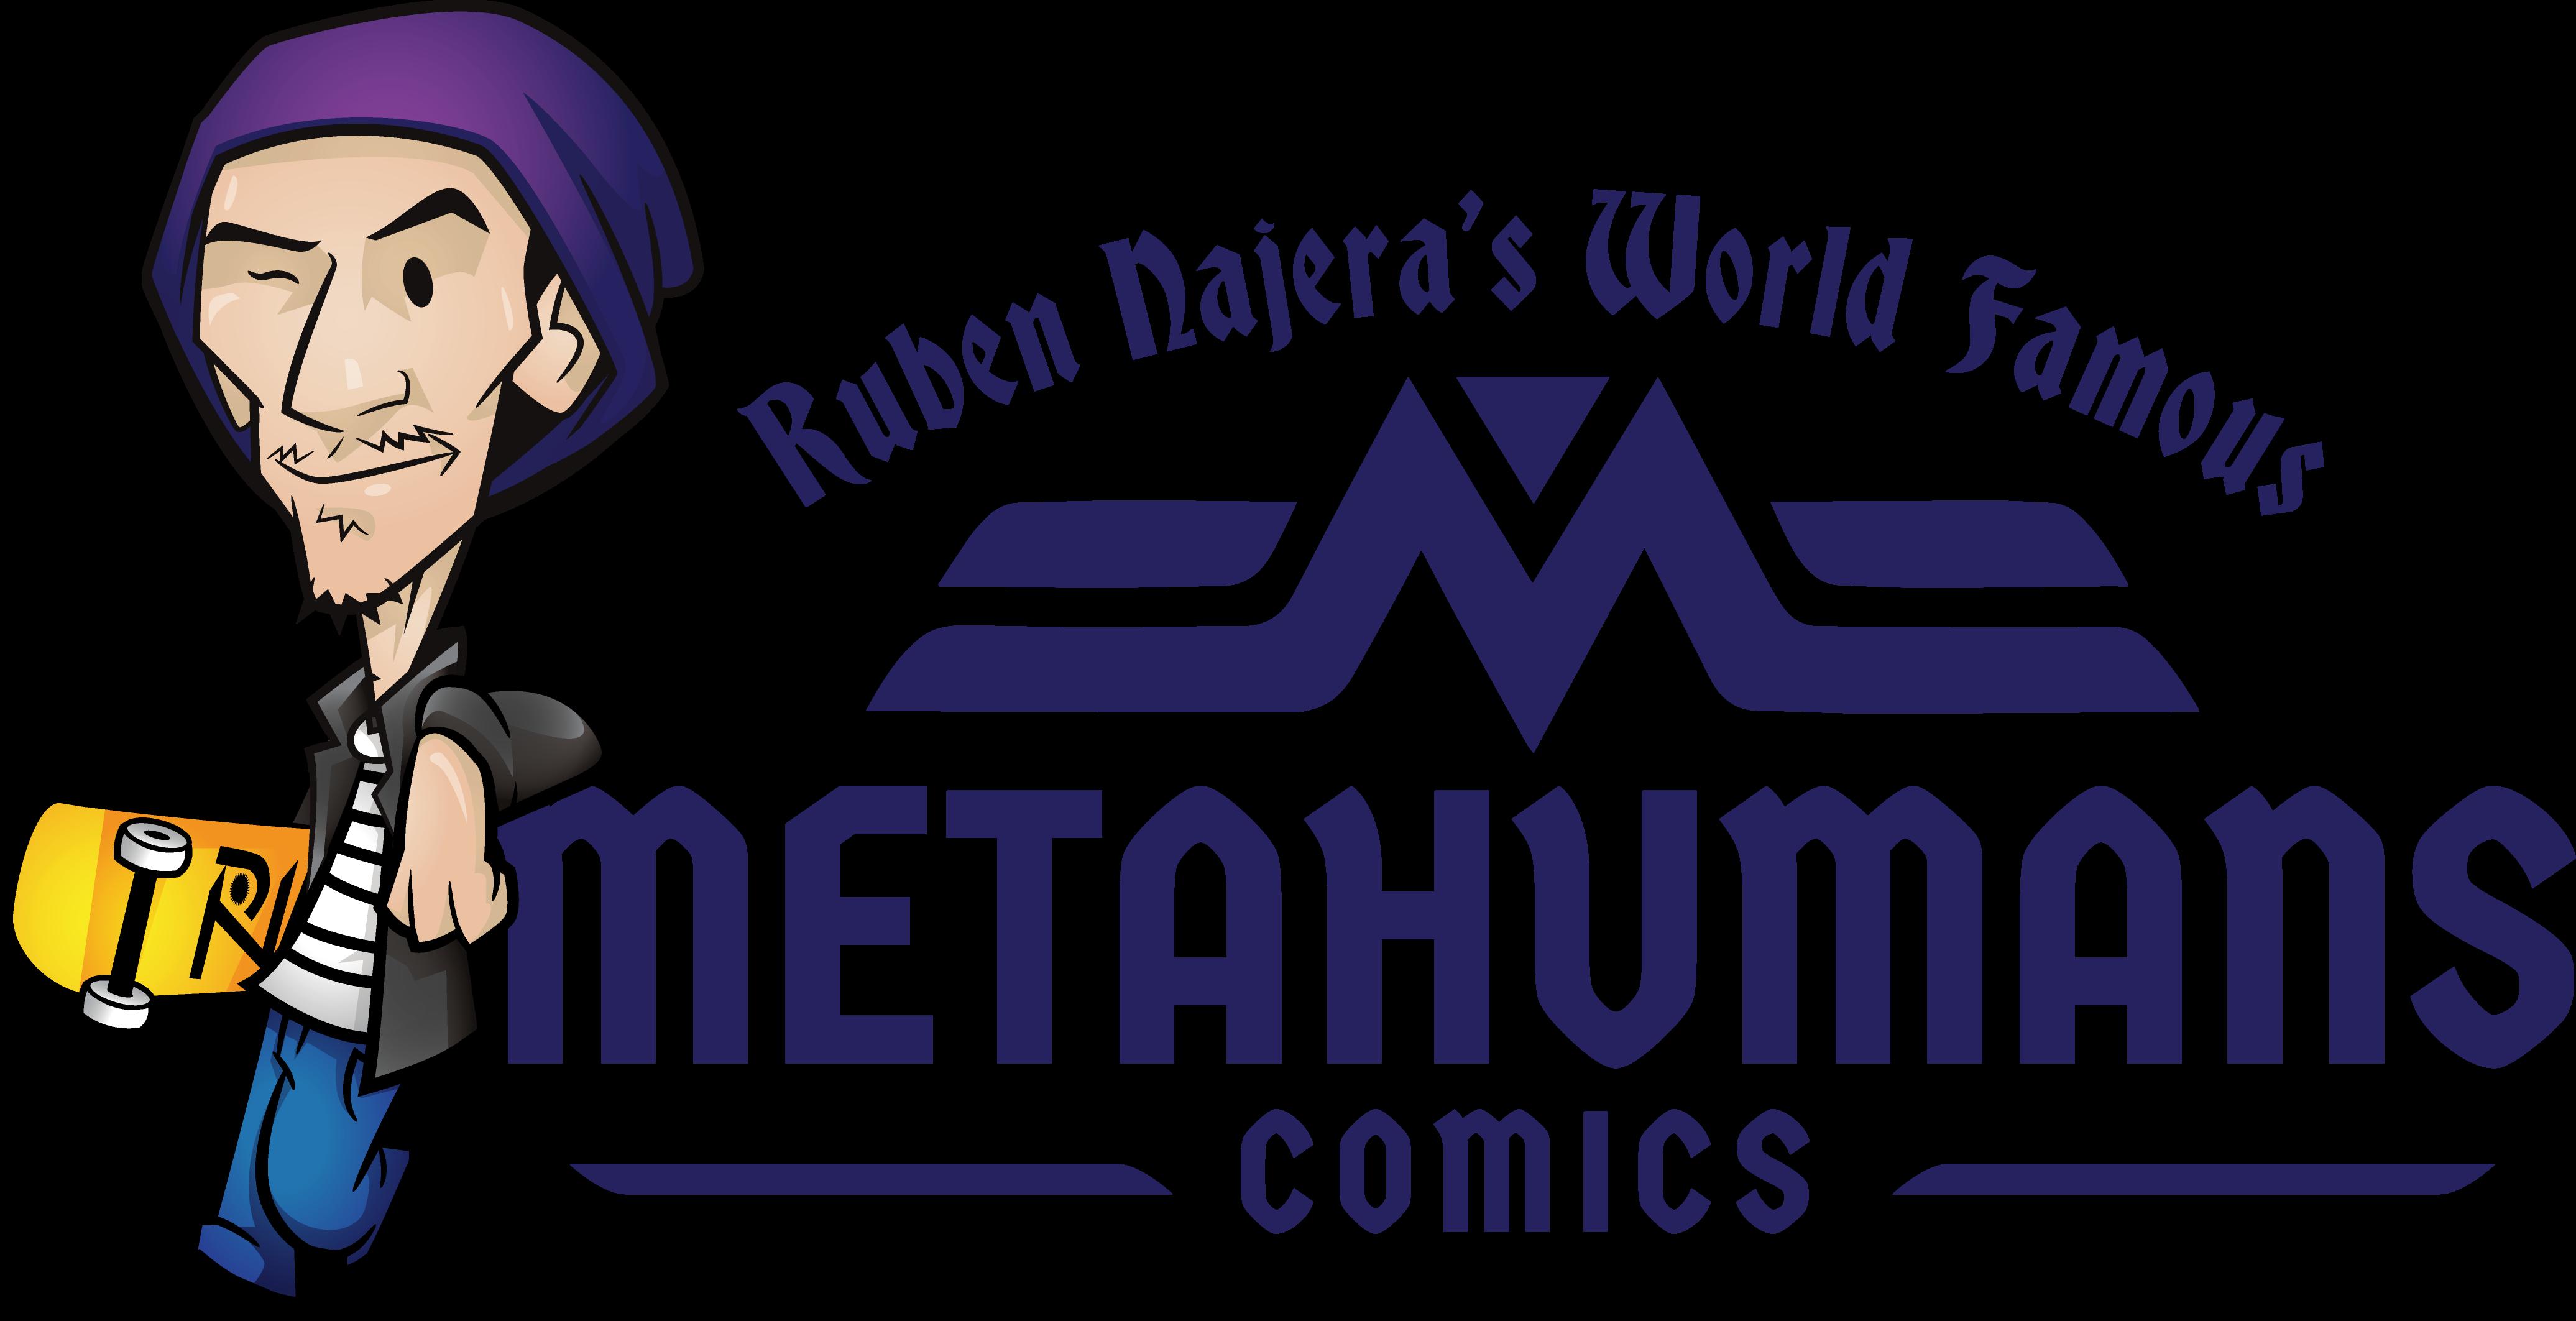 http://metahumanscomics.com